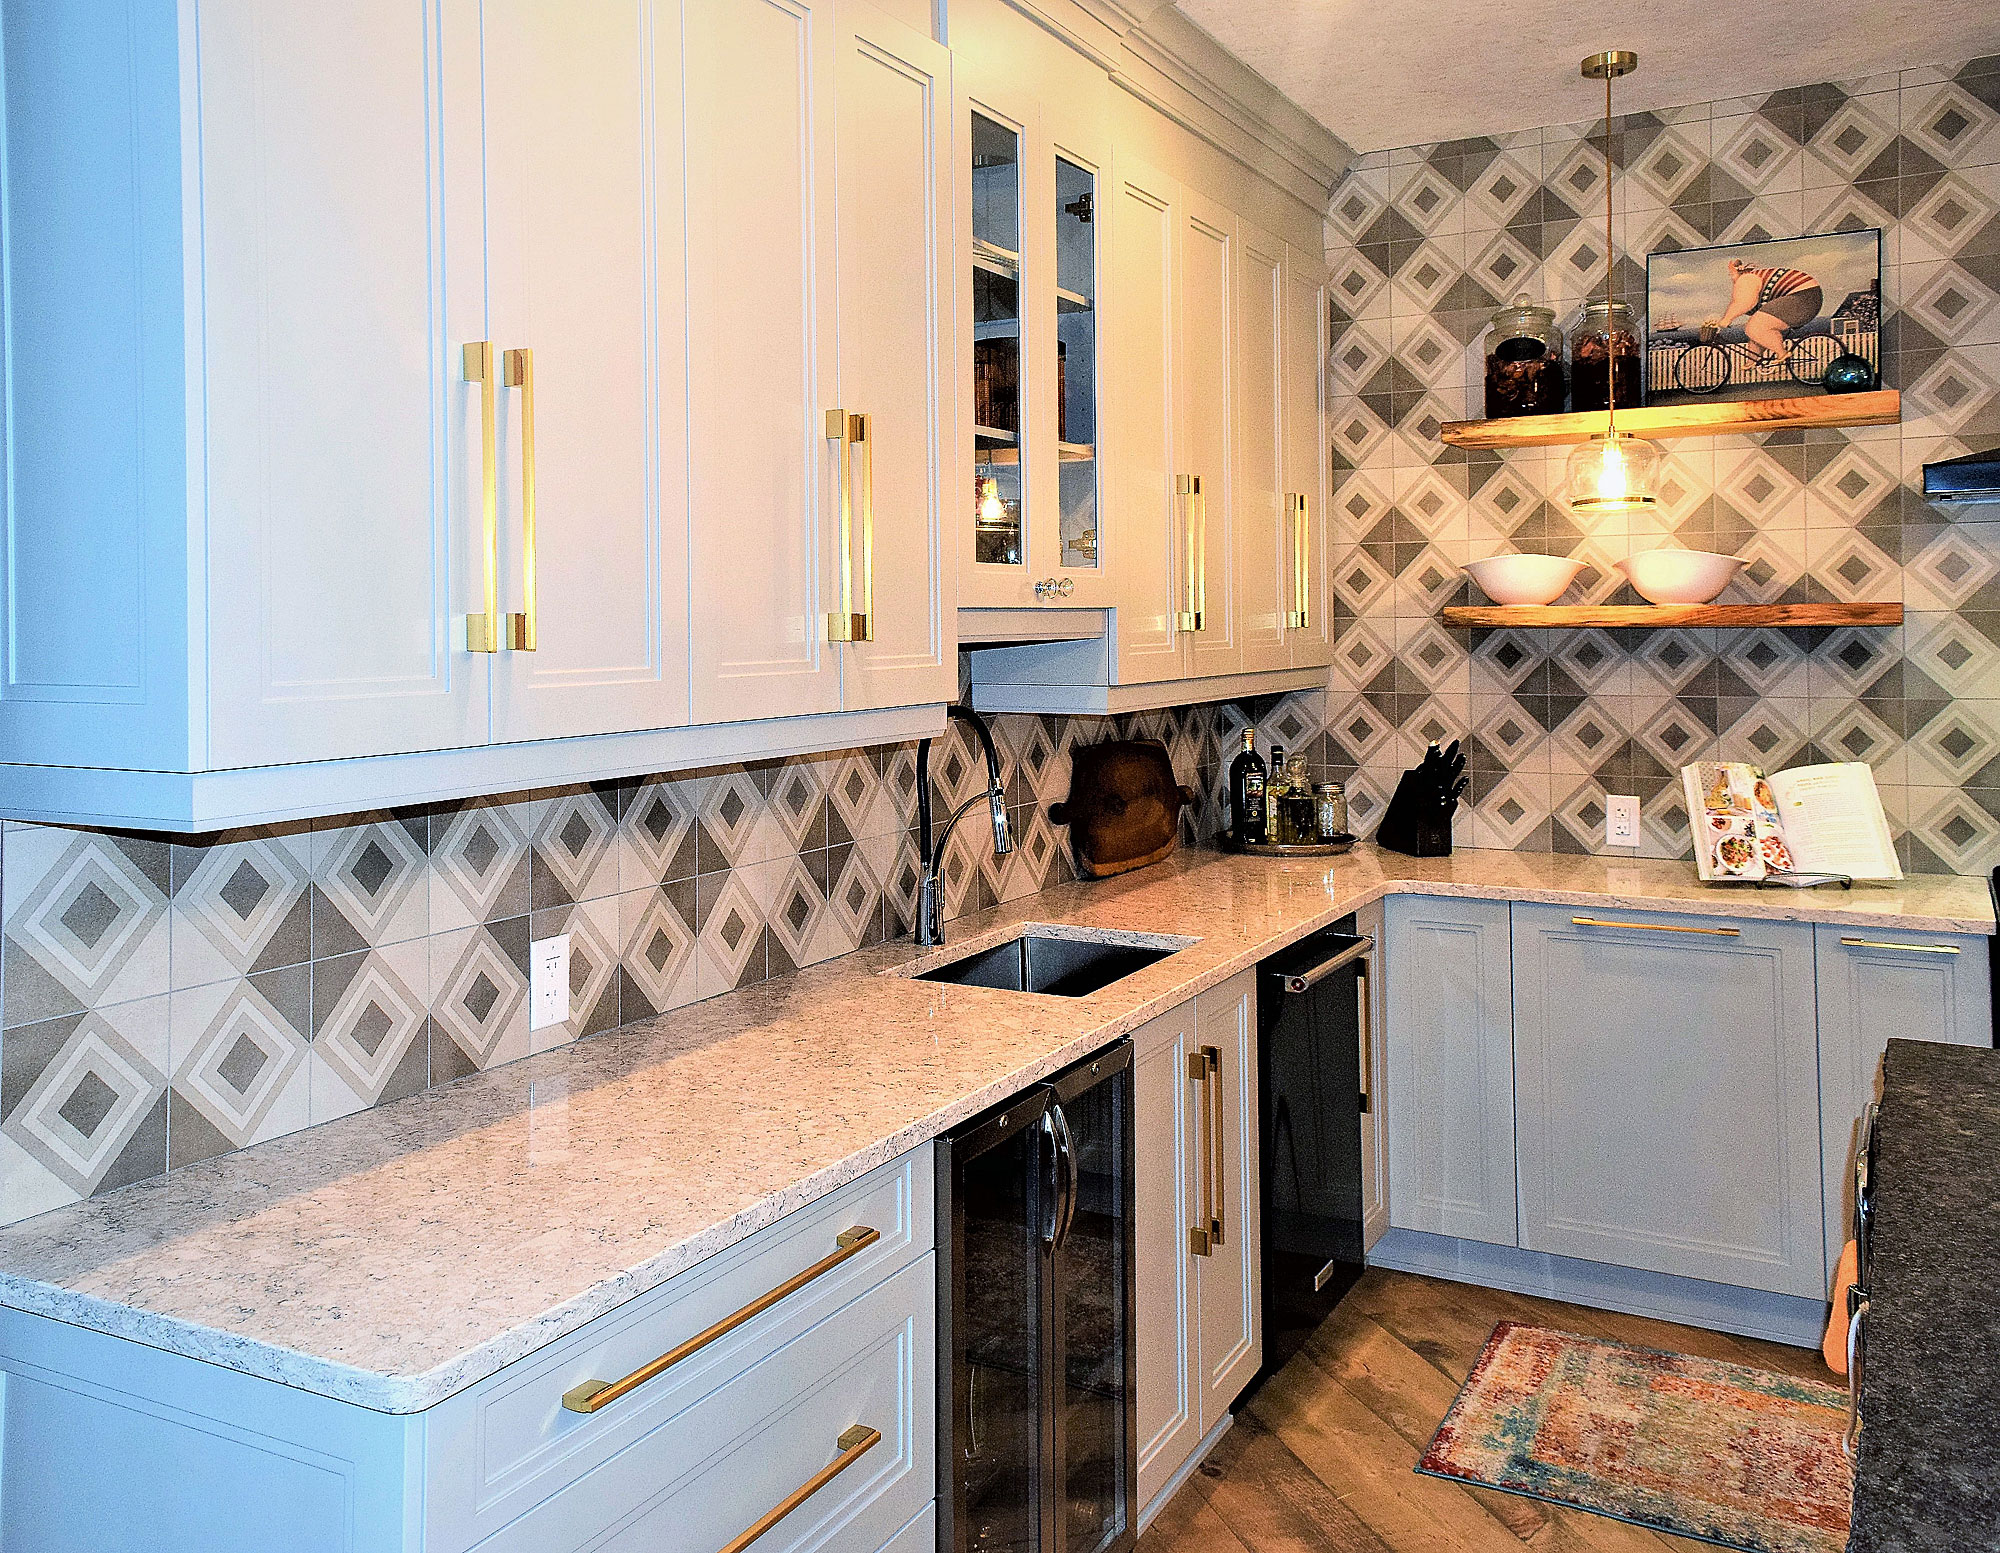 Luxor custom cabinets - Kitchens Ontario